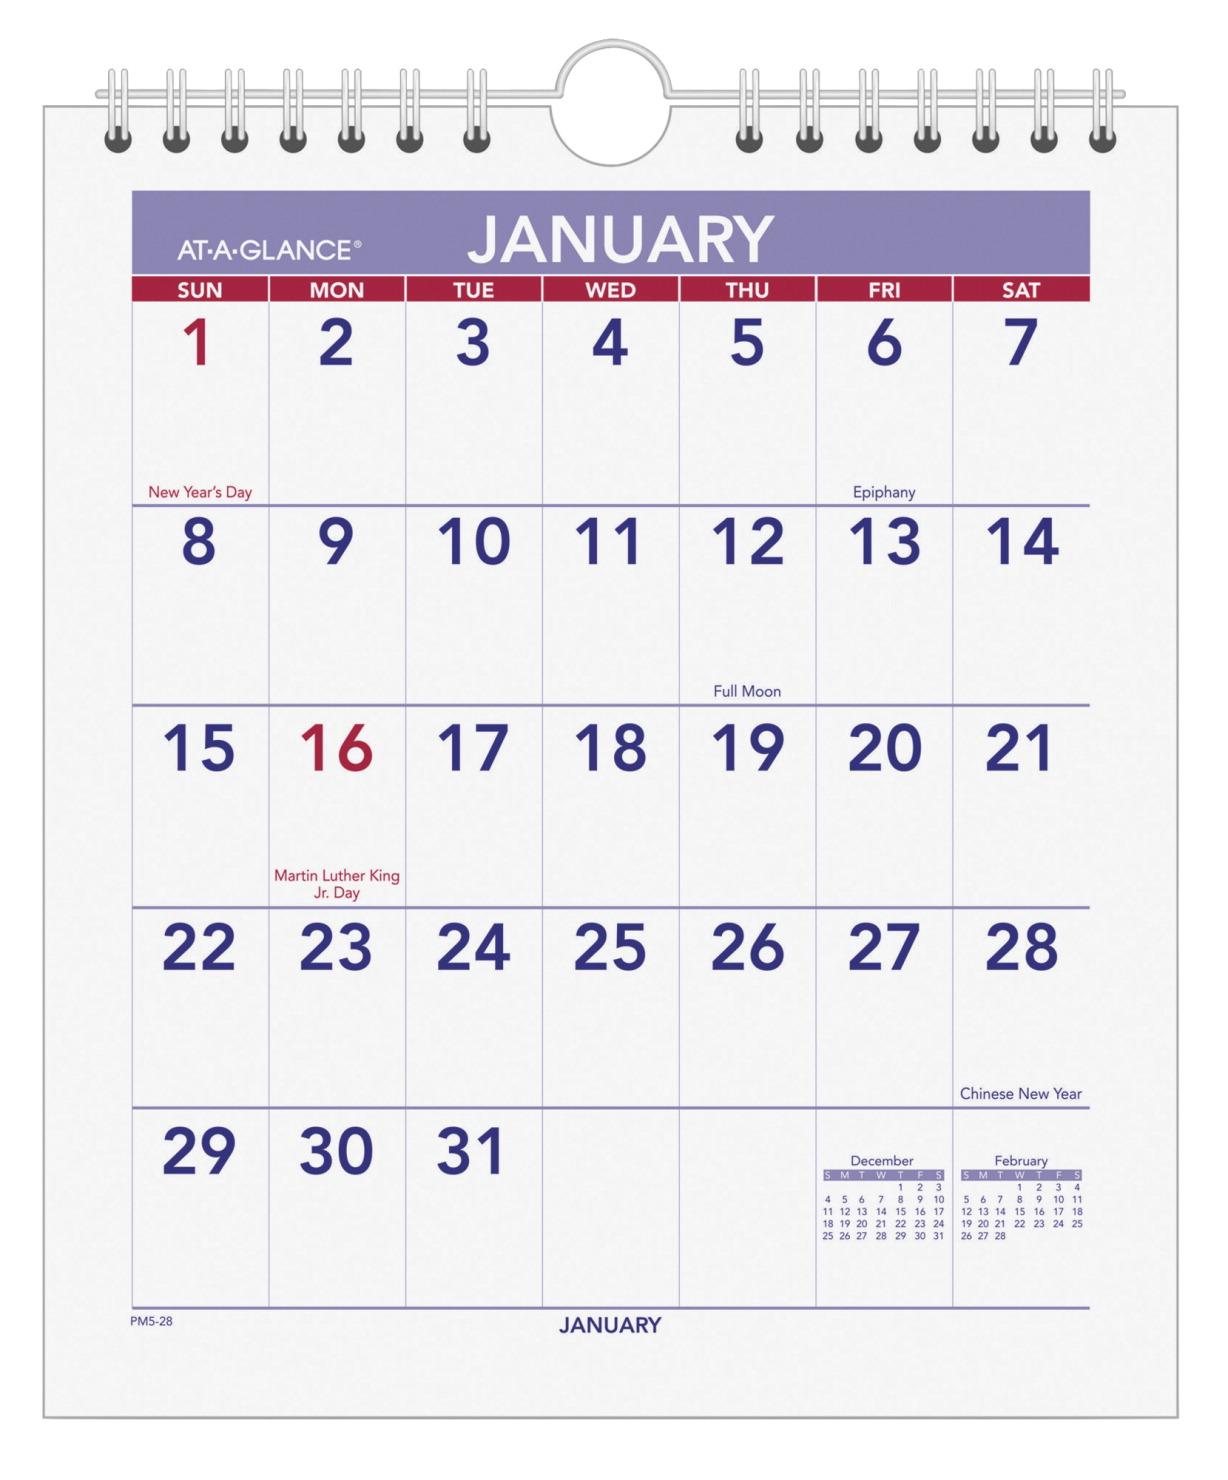 18cdb8f886c At-A-Glance Mini Monthly Wall Calendar, Jan-Dec, 6-1/2 x 7-1/2 Inches -  SOAR Life Products